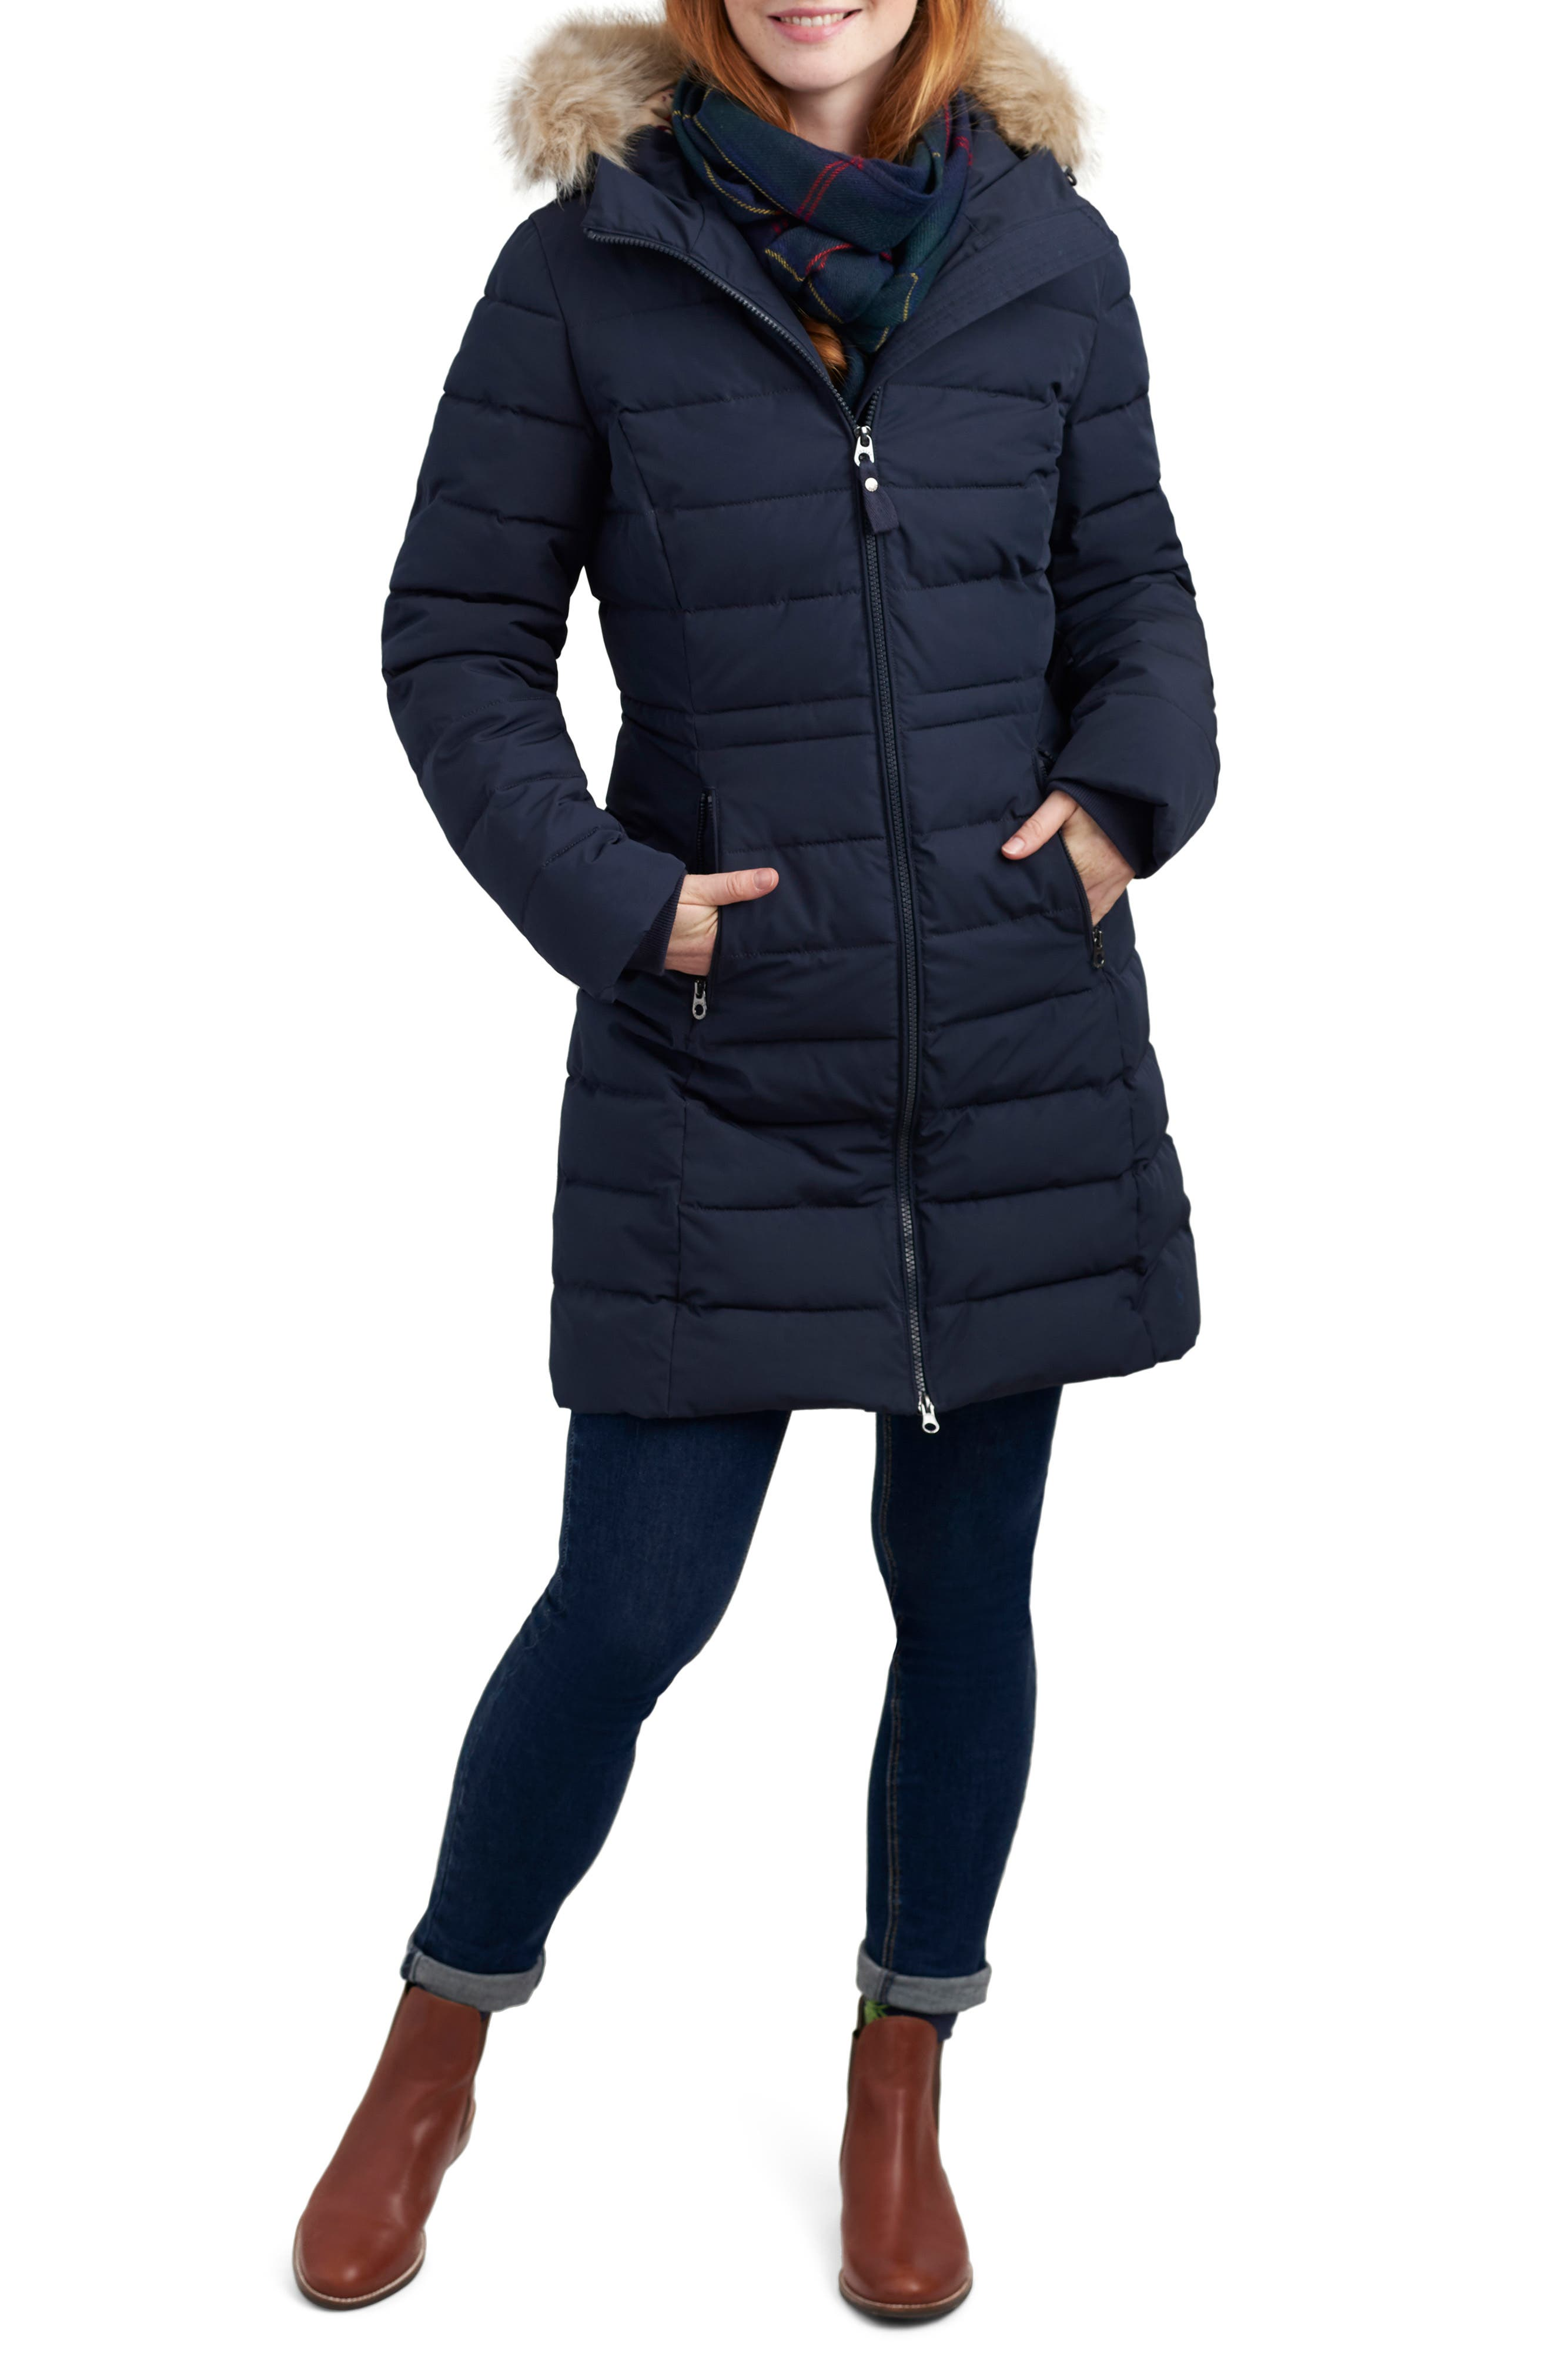 Sefton Longline Padded Jacket,                             Main thumbnail 1, color,                             MARINE NAVY